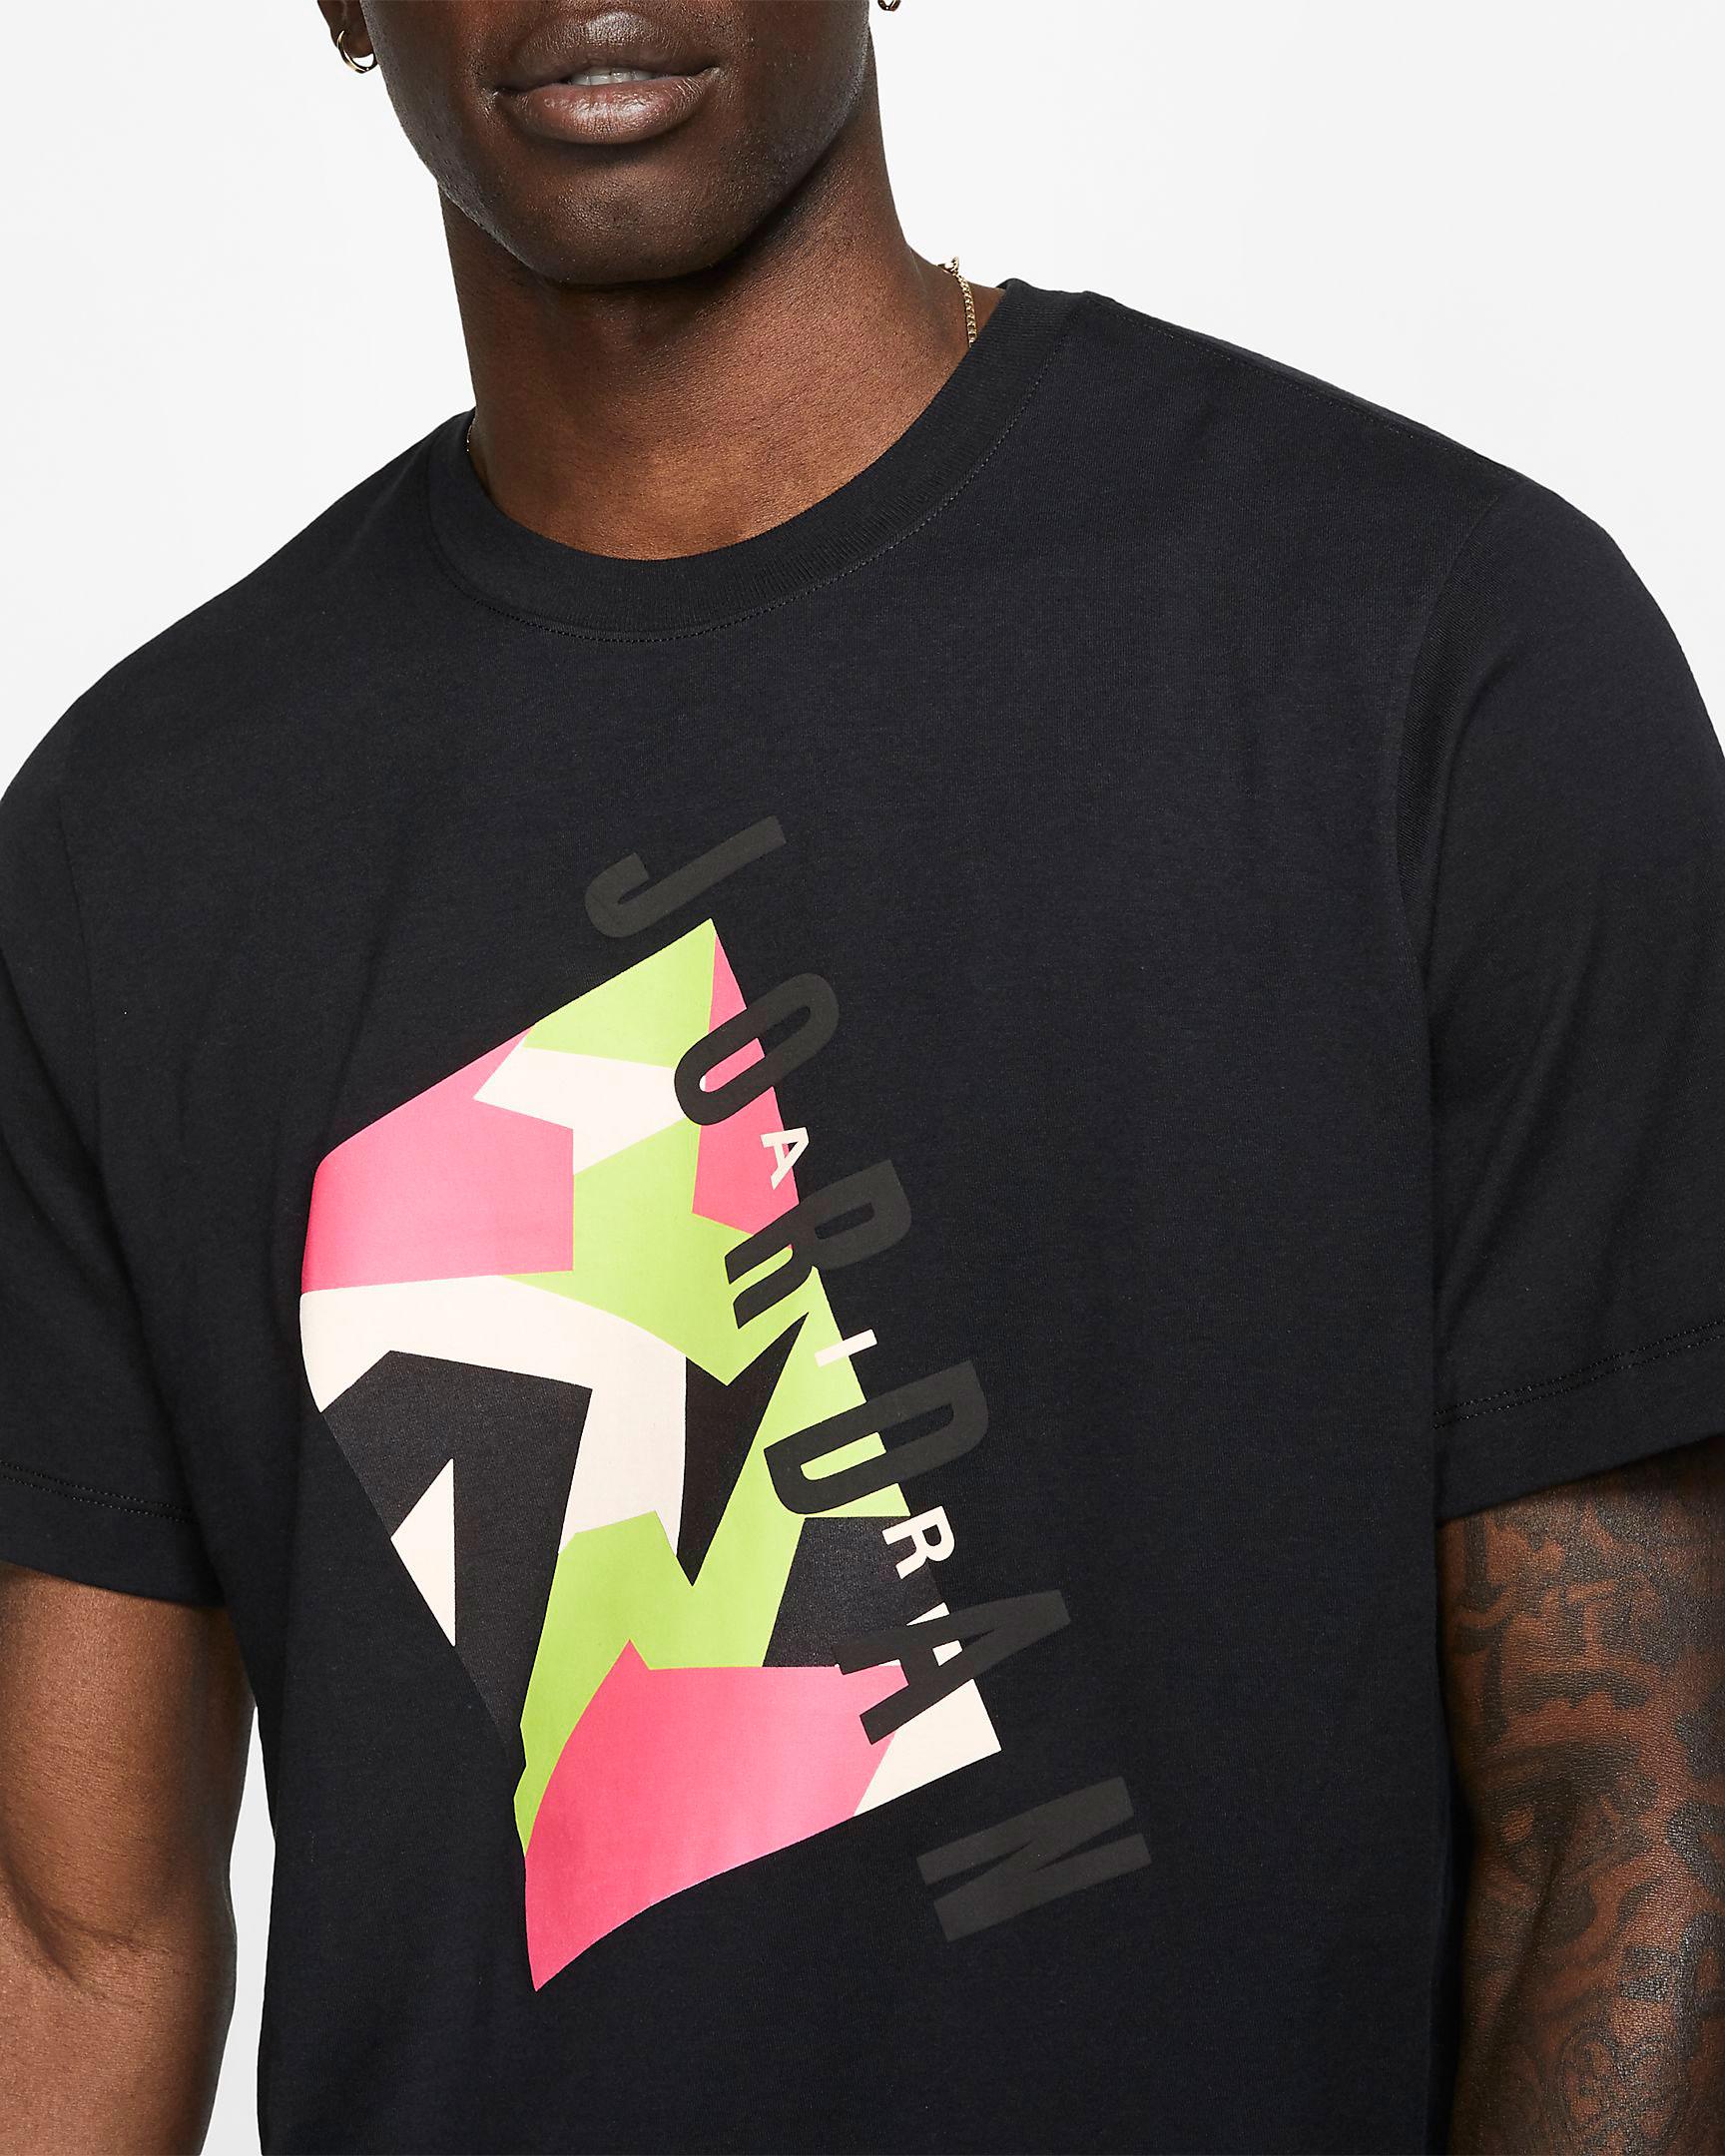 air-jordan-1-mid-hyper-pink-sneaker-tee-shirt-2